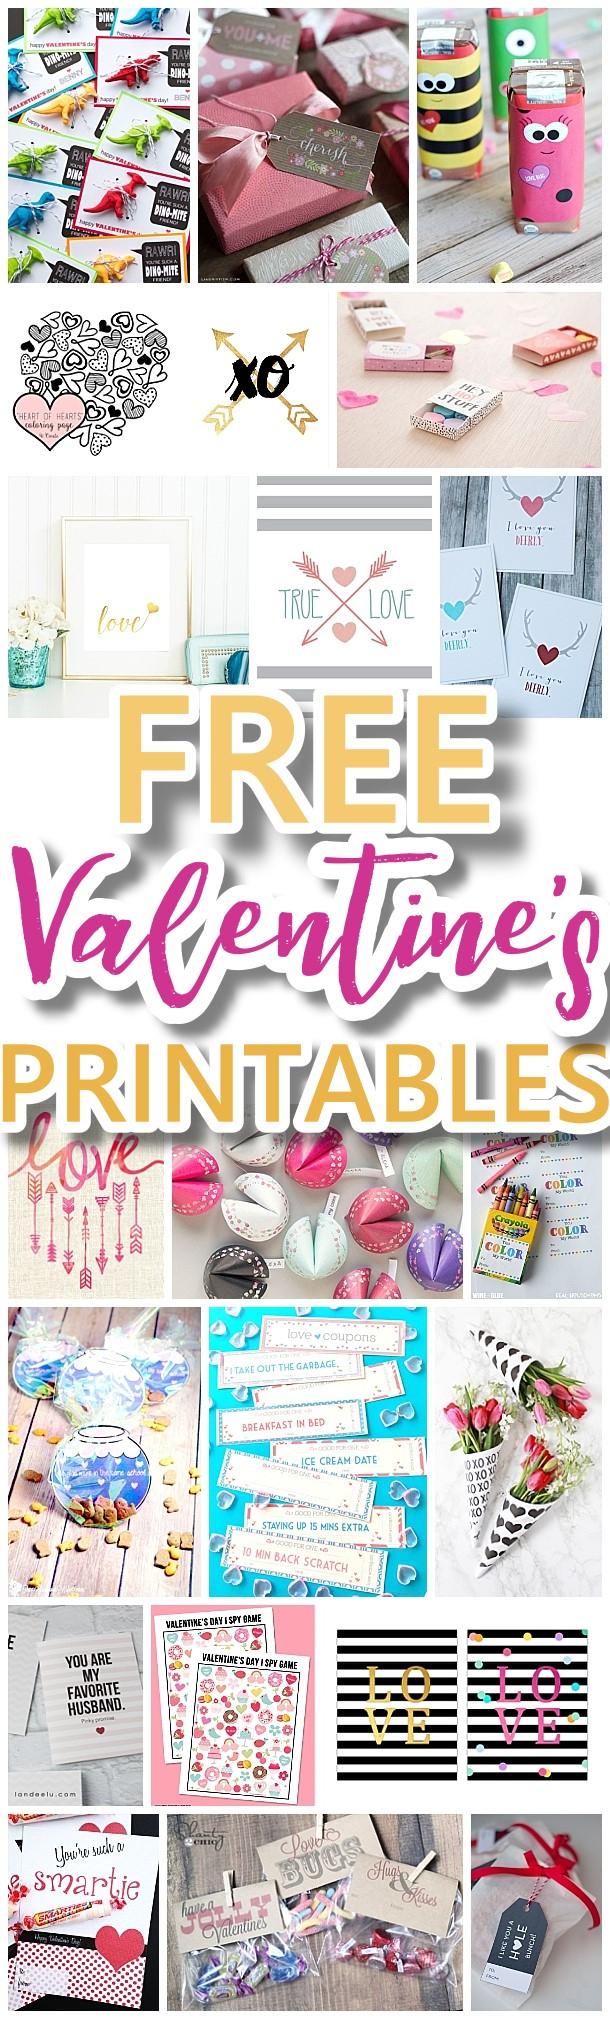 The Best Valentine's Day Free Printables – Kids Classmate Cards - Free Printable Valentine's Day Decorations